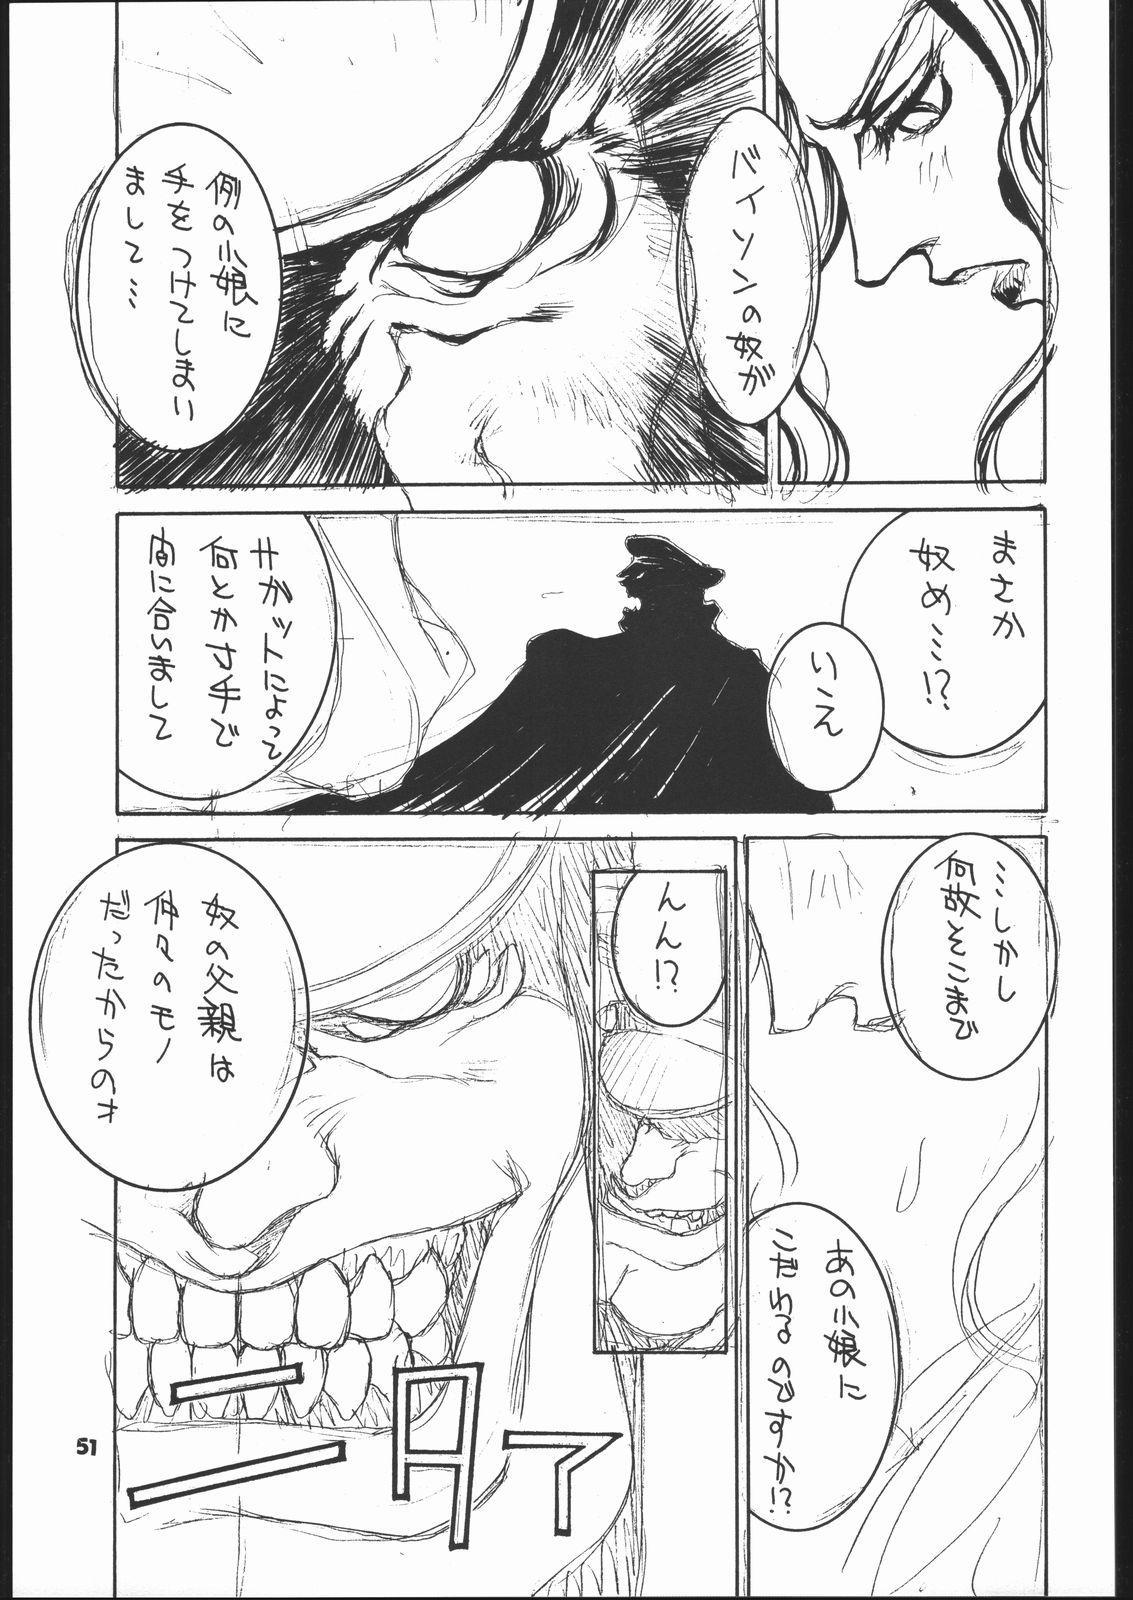 kakutou geemu hon 49